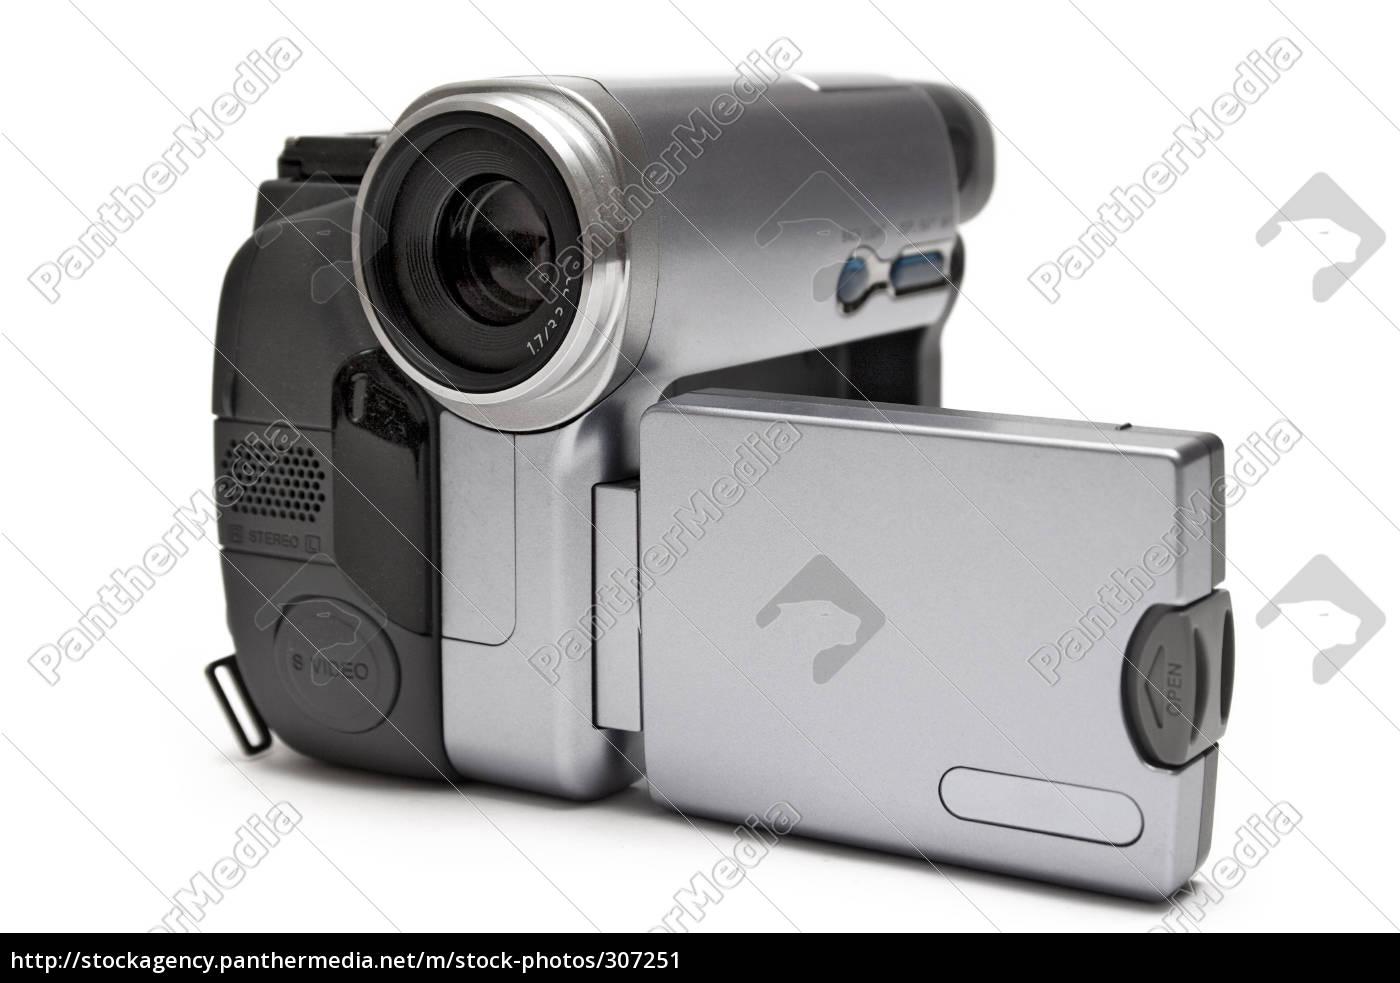 camcorder - 307251